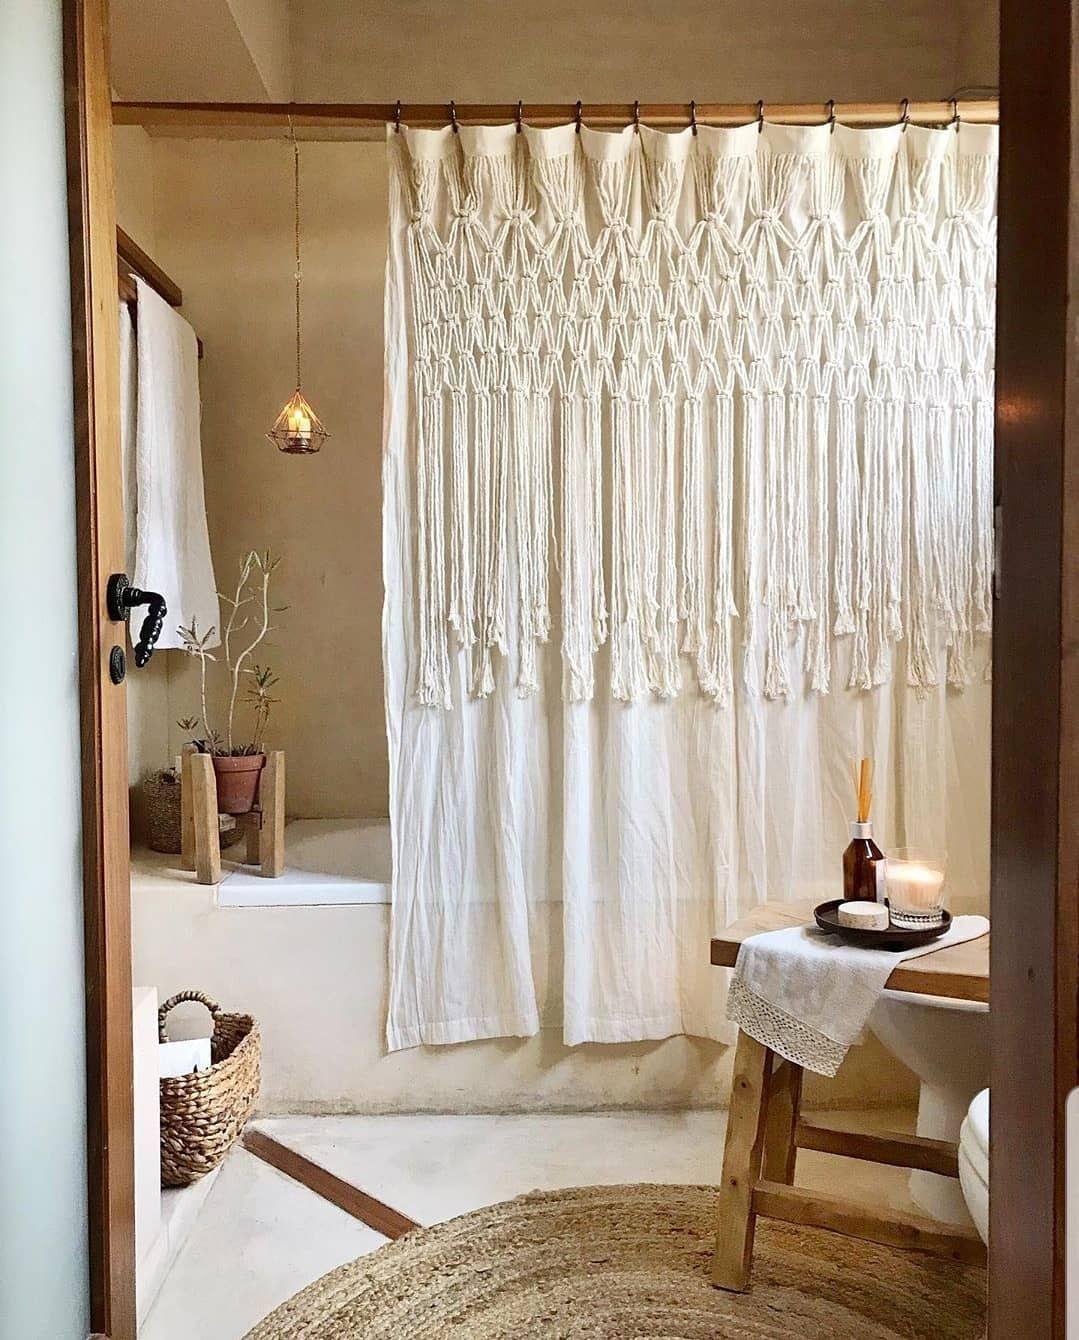 Beautiful White Bohemian Shower Curtain With Macrame Detailing Trending In Bathroom Decor Ai Lace Shower Curtains Cool Shower Curtains White Shower Curtain